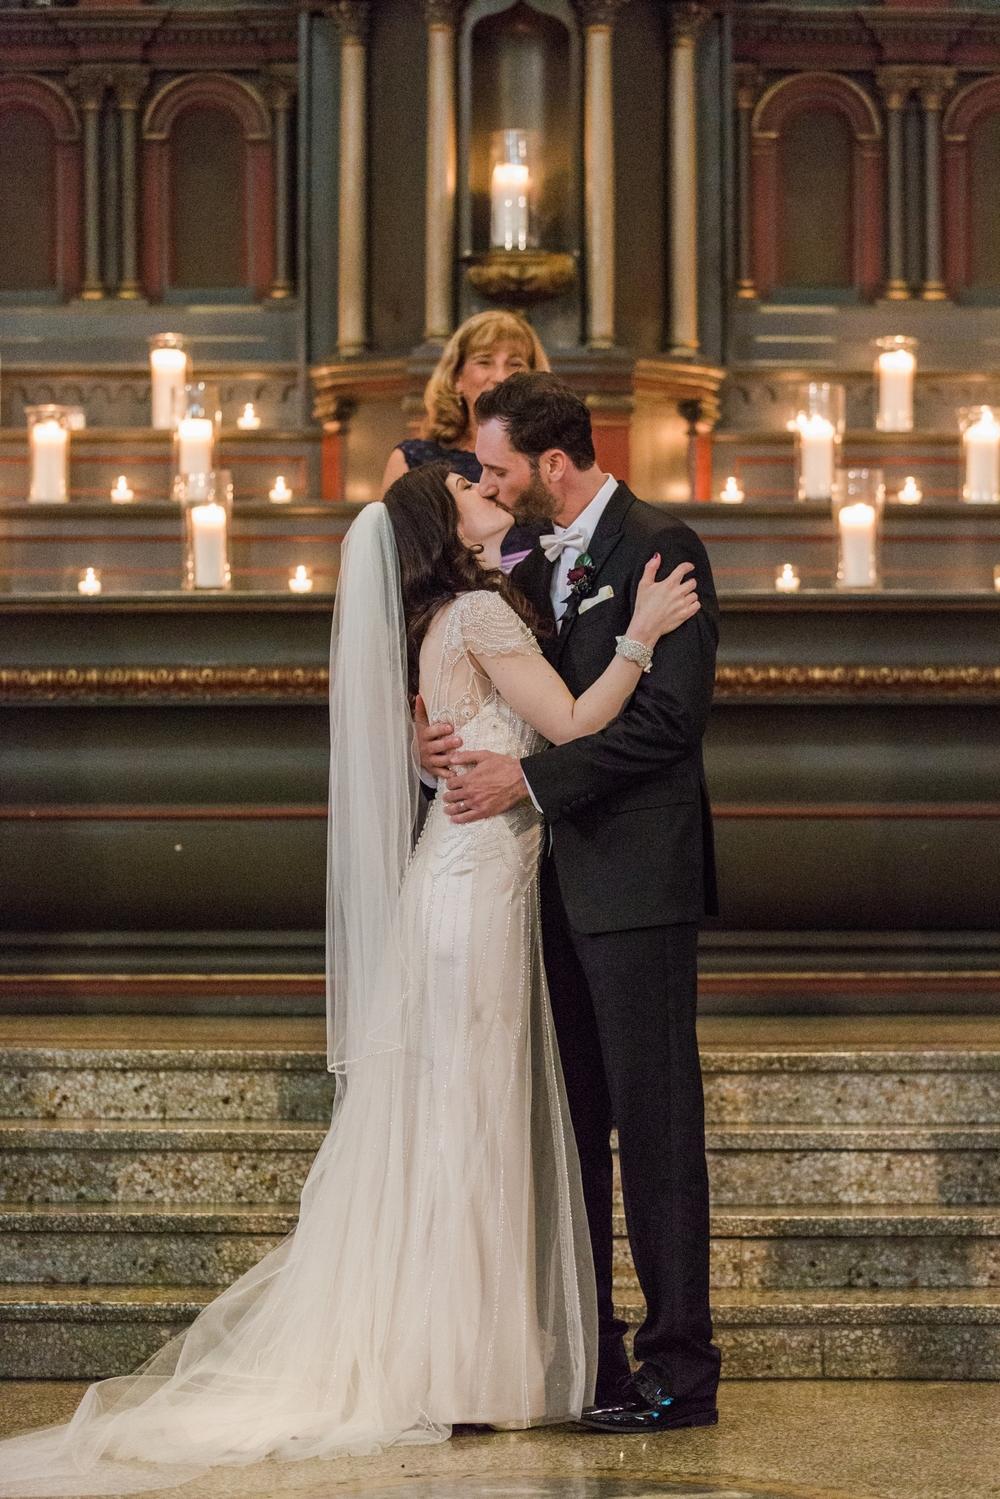 Bell_Event_Centre_Cincinnati_Ohio_Wedding_Photography_Chloe_Luka_Photography_6491.jpg